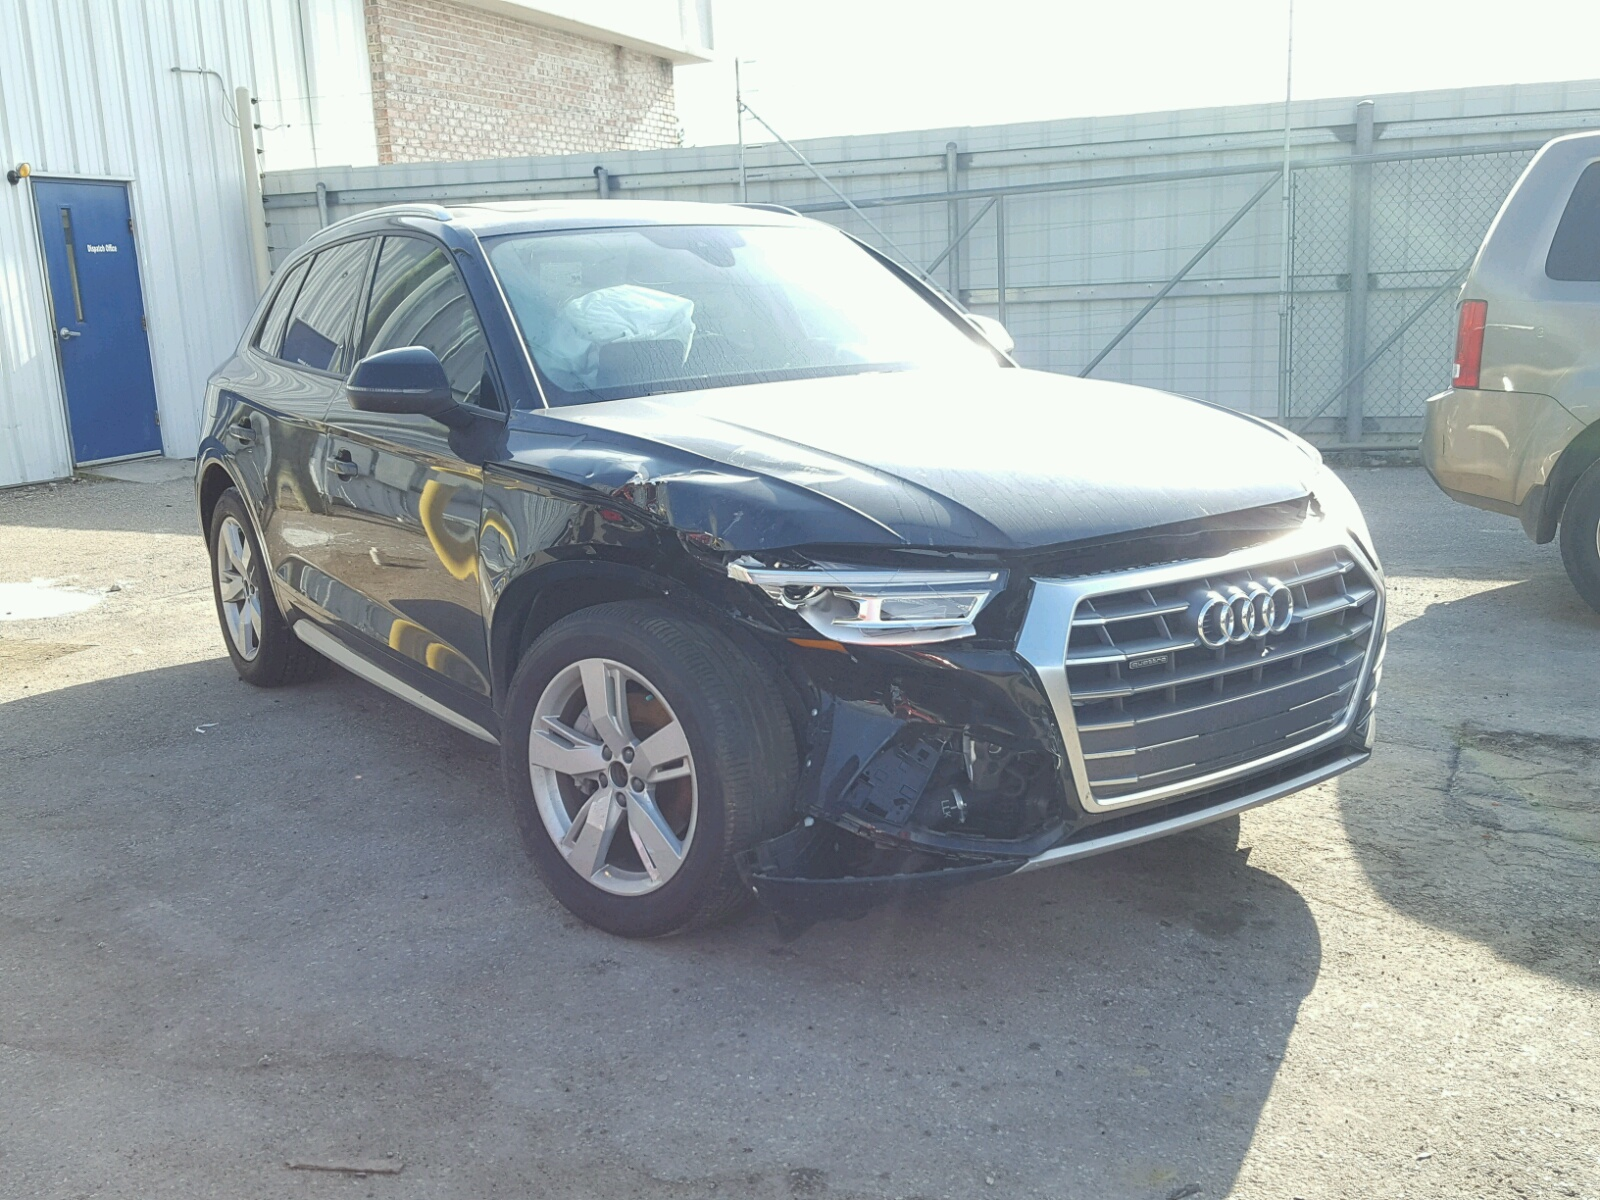 Audi Q Premium For Sale At Copart Montgomery AL Lot - Audi montgomery